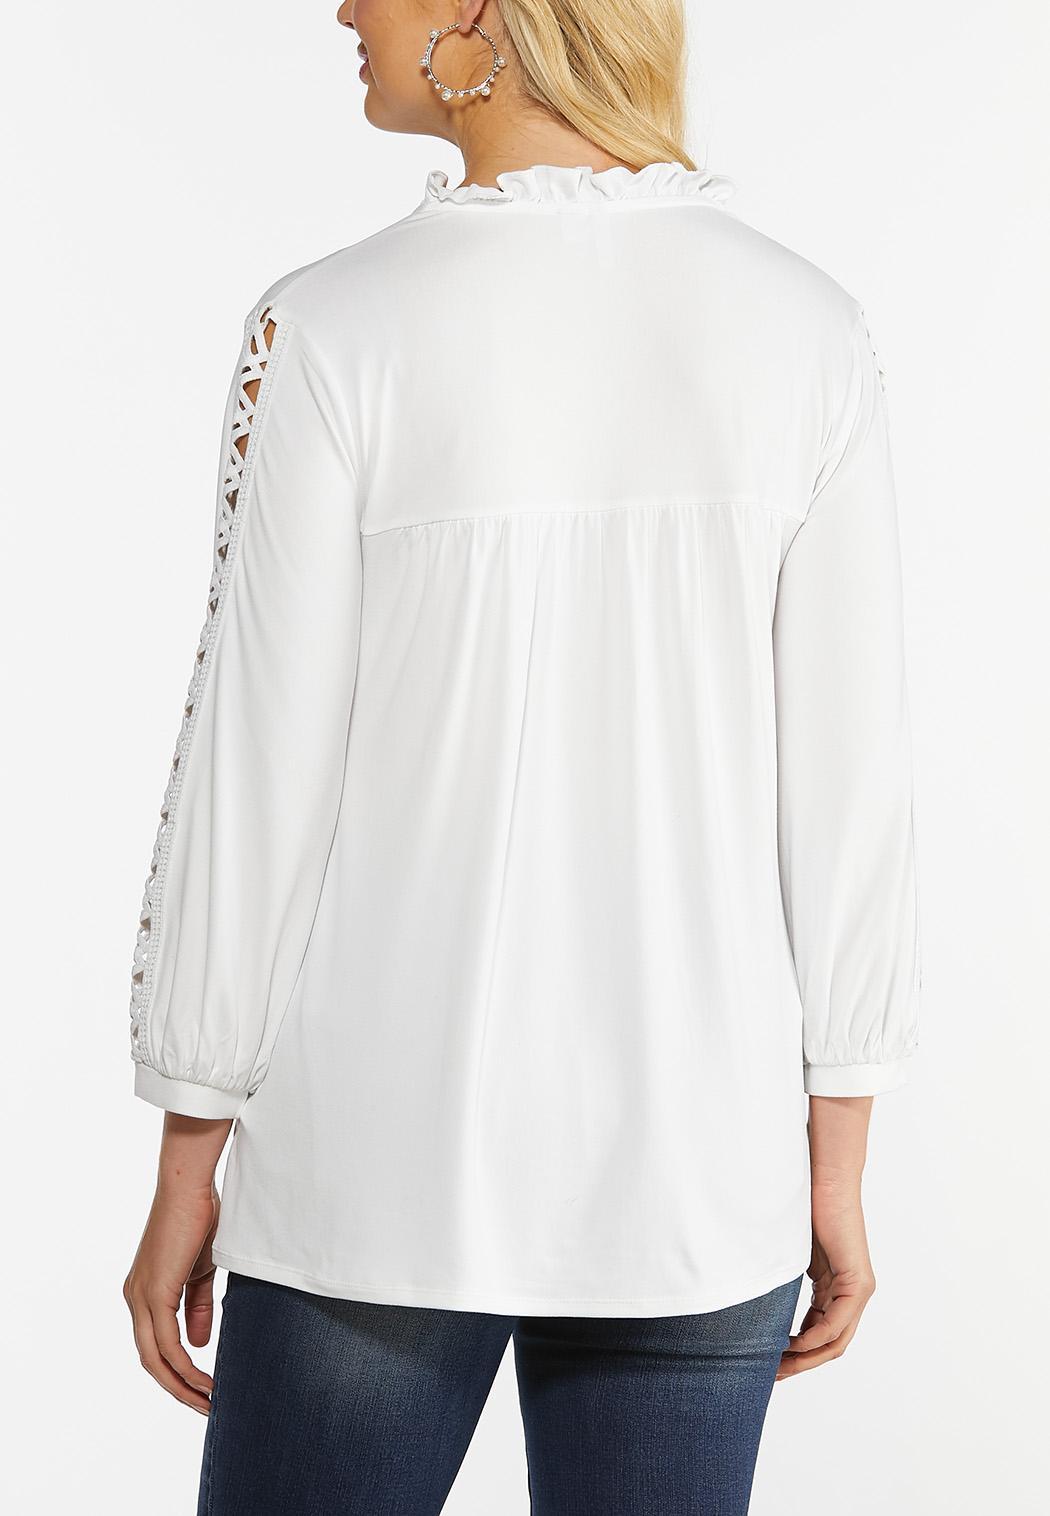 Plus Size Zig Zag Cutout Sleeve Top (Item #44392554)